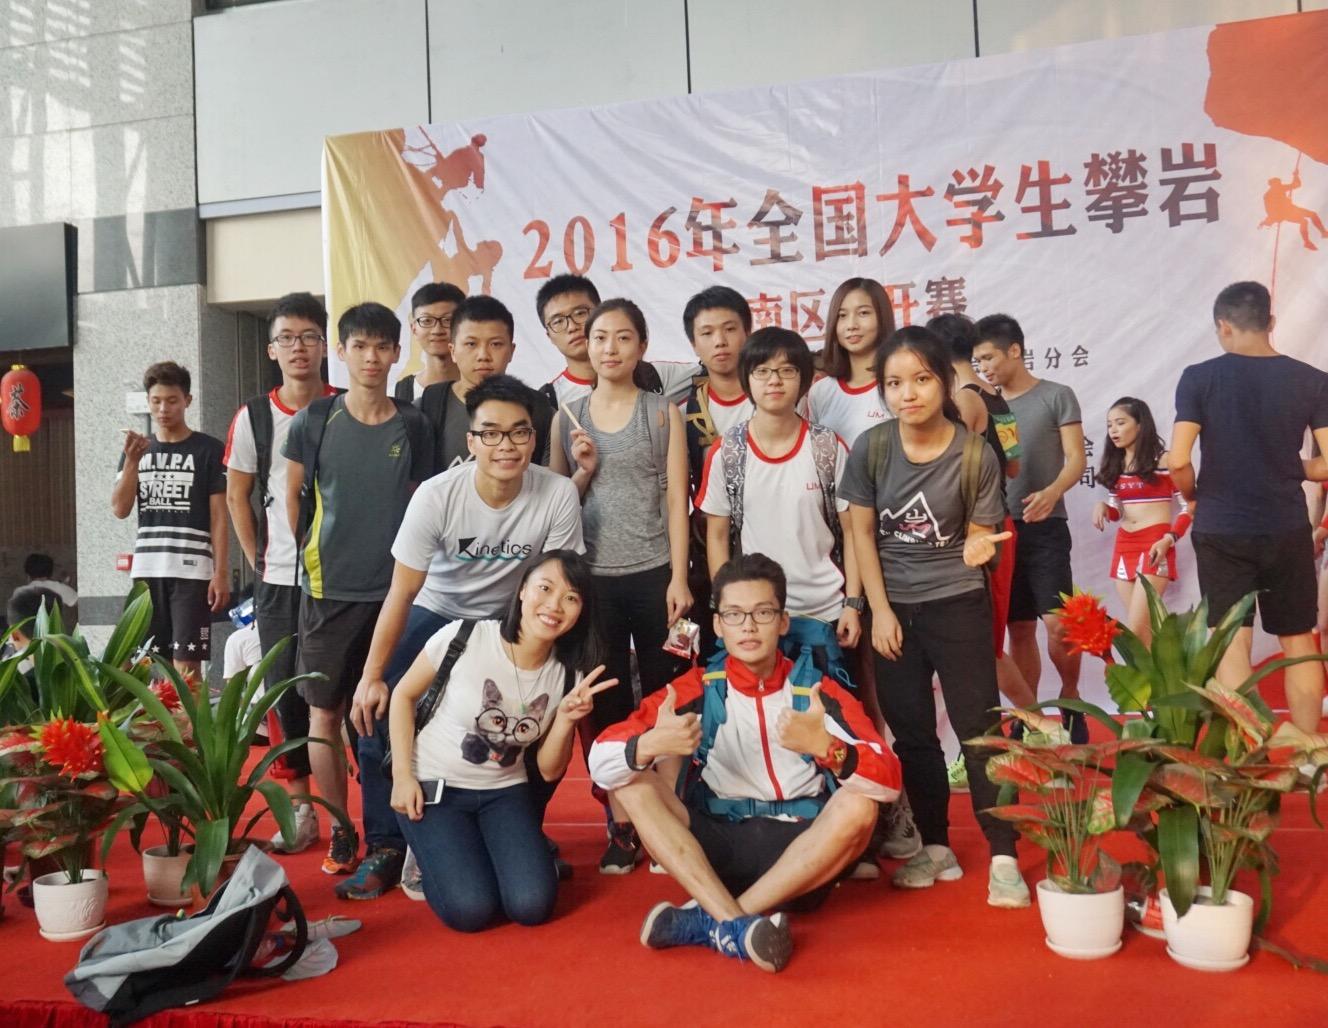 Members of UM's Rock Climbing Team